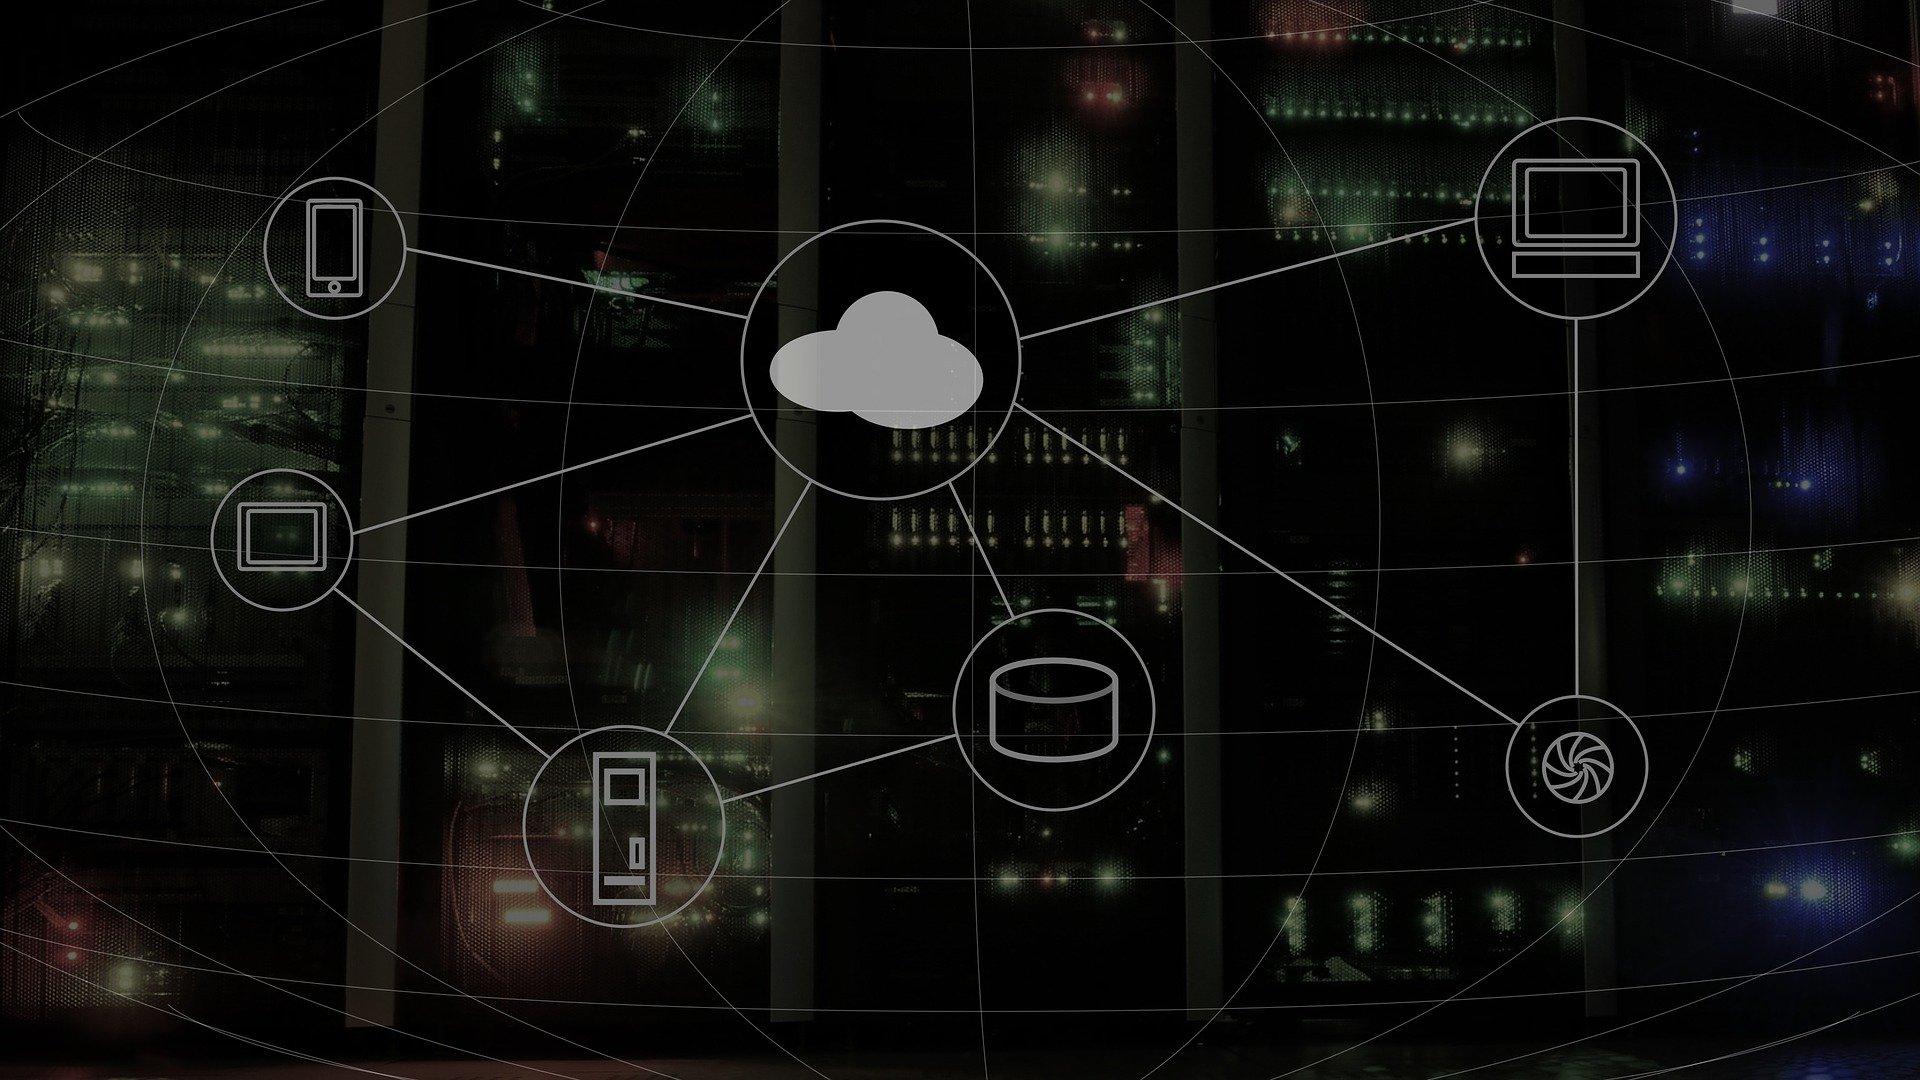 AWS Wavelength 與 Verizon 提供全球首個 5G 網絡邊緣運算